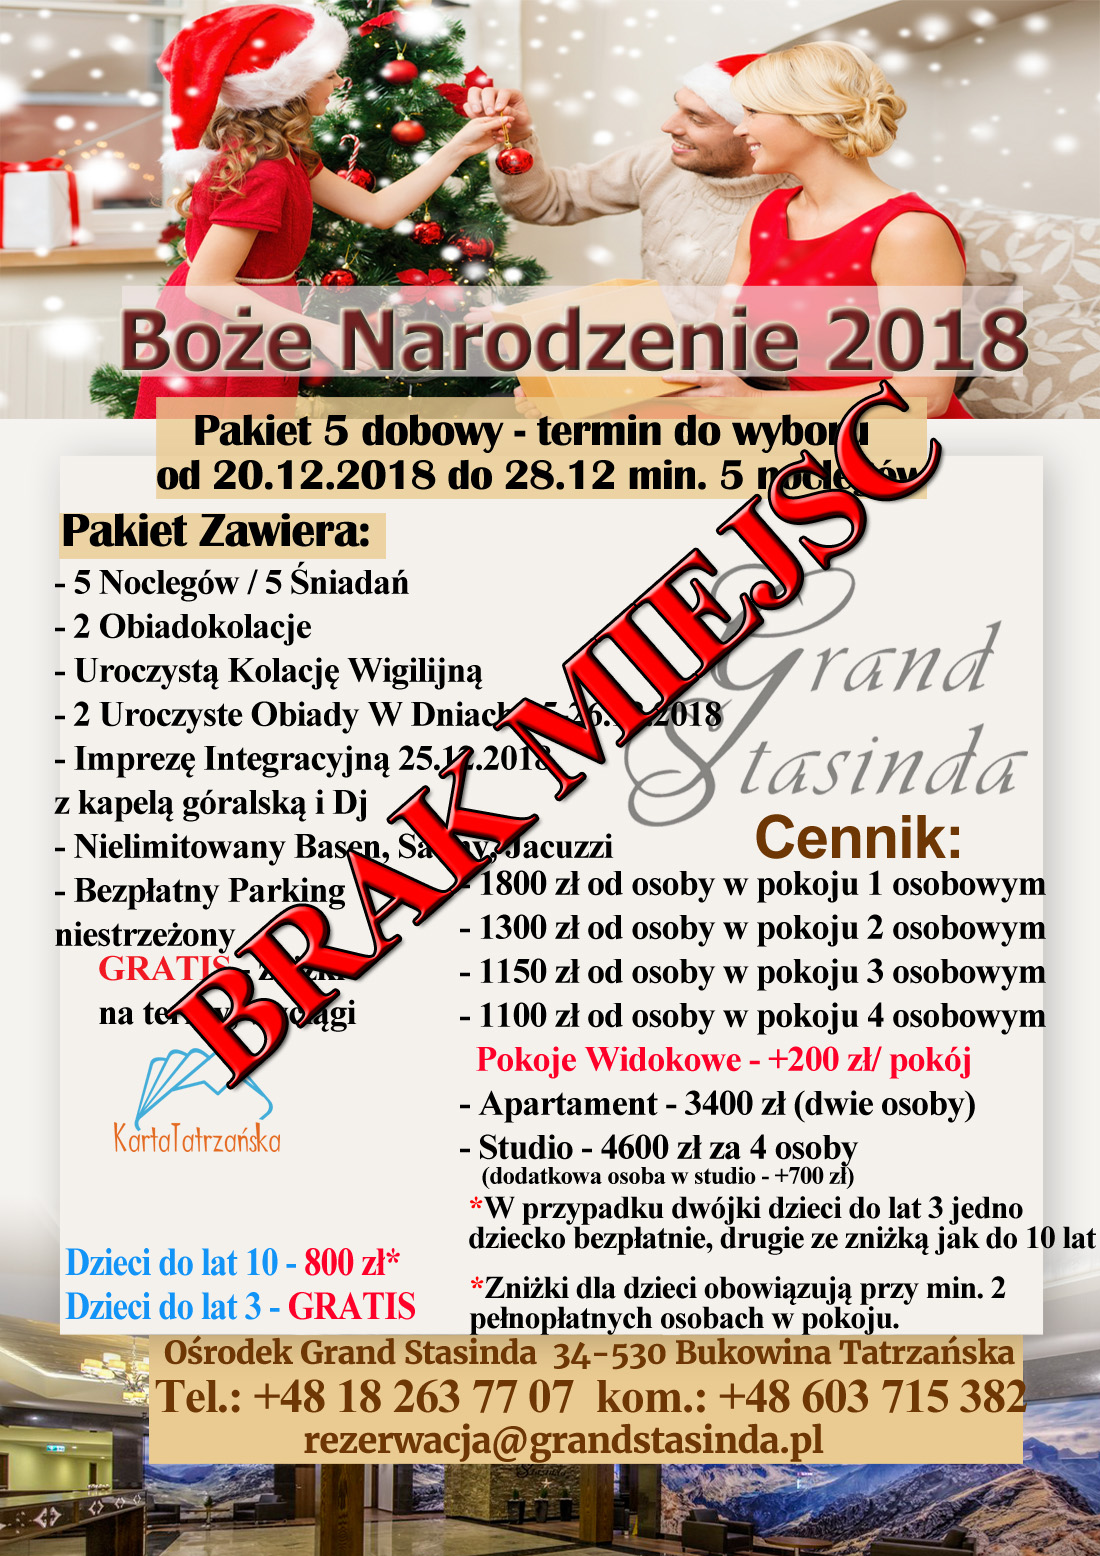 Grand Stasinda Bukowina Tatrzańska Noclegi Hotelowy Standard